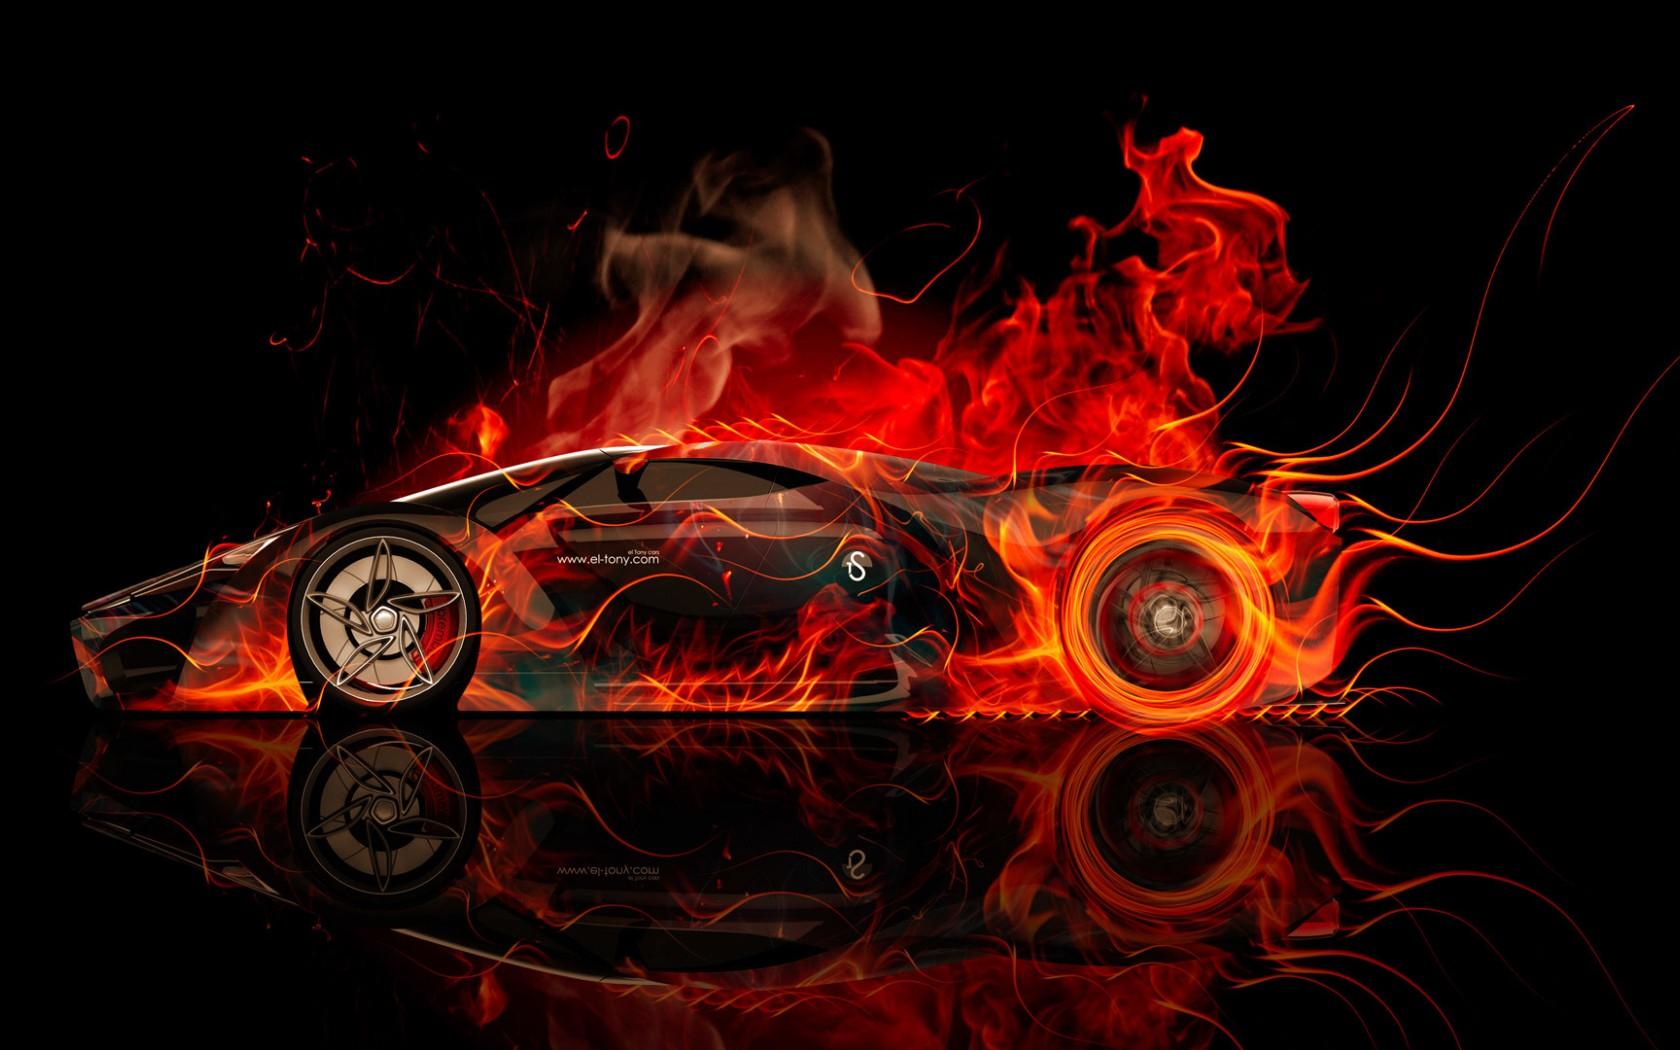 1 Ferrari F80 Hd Wallpapers Backgrounds Wallpaper Abyss